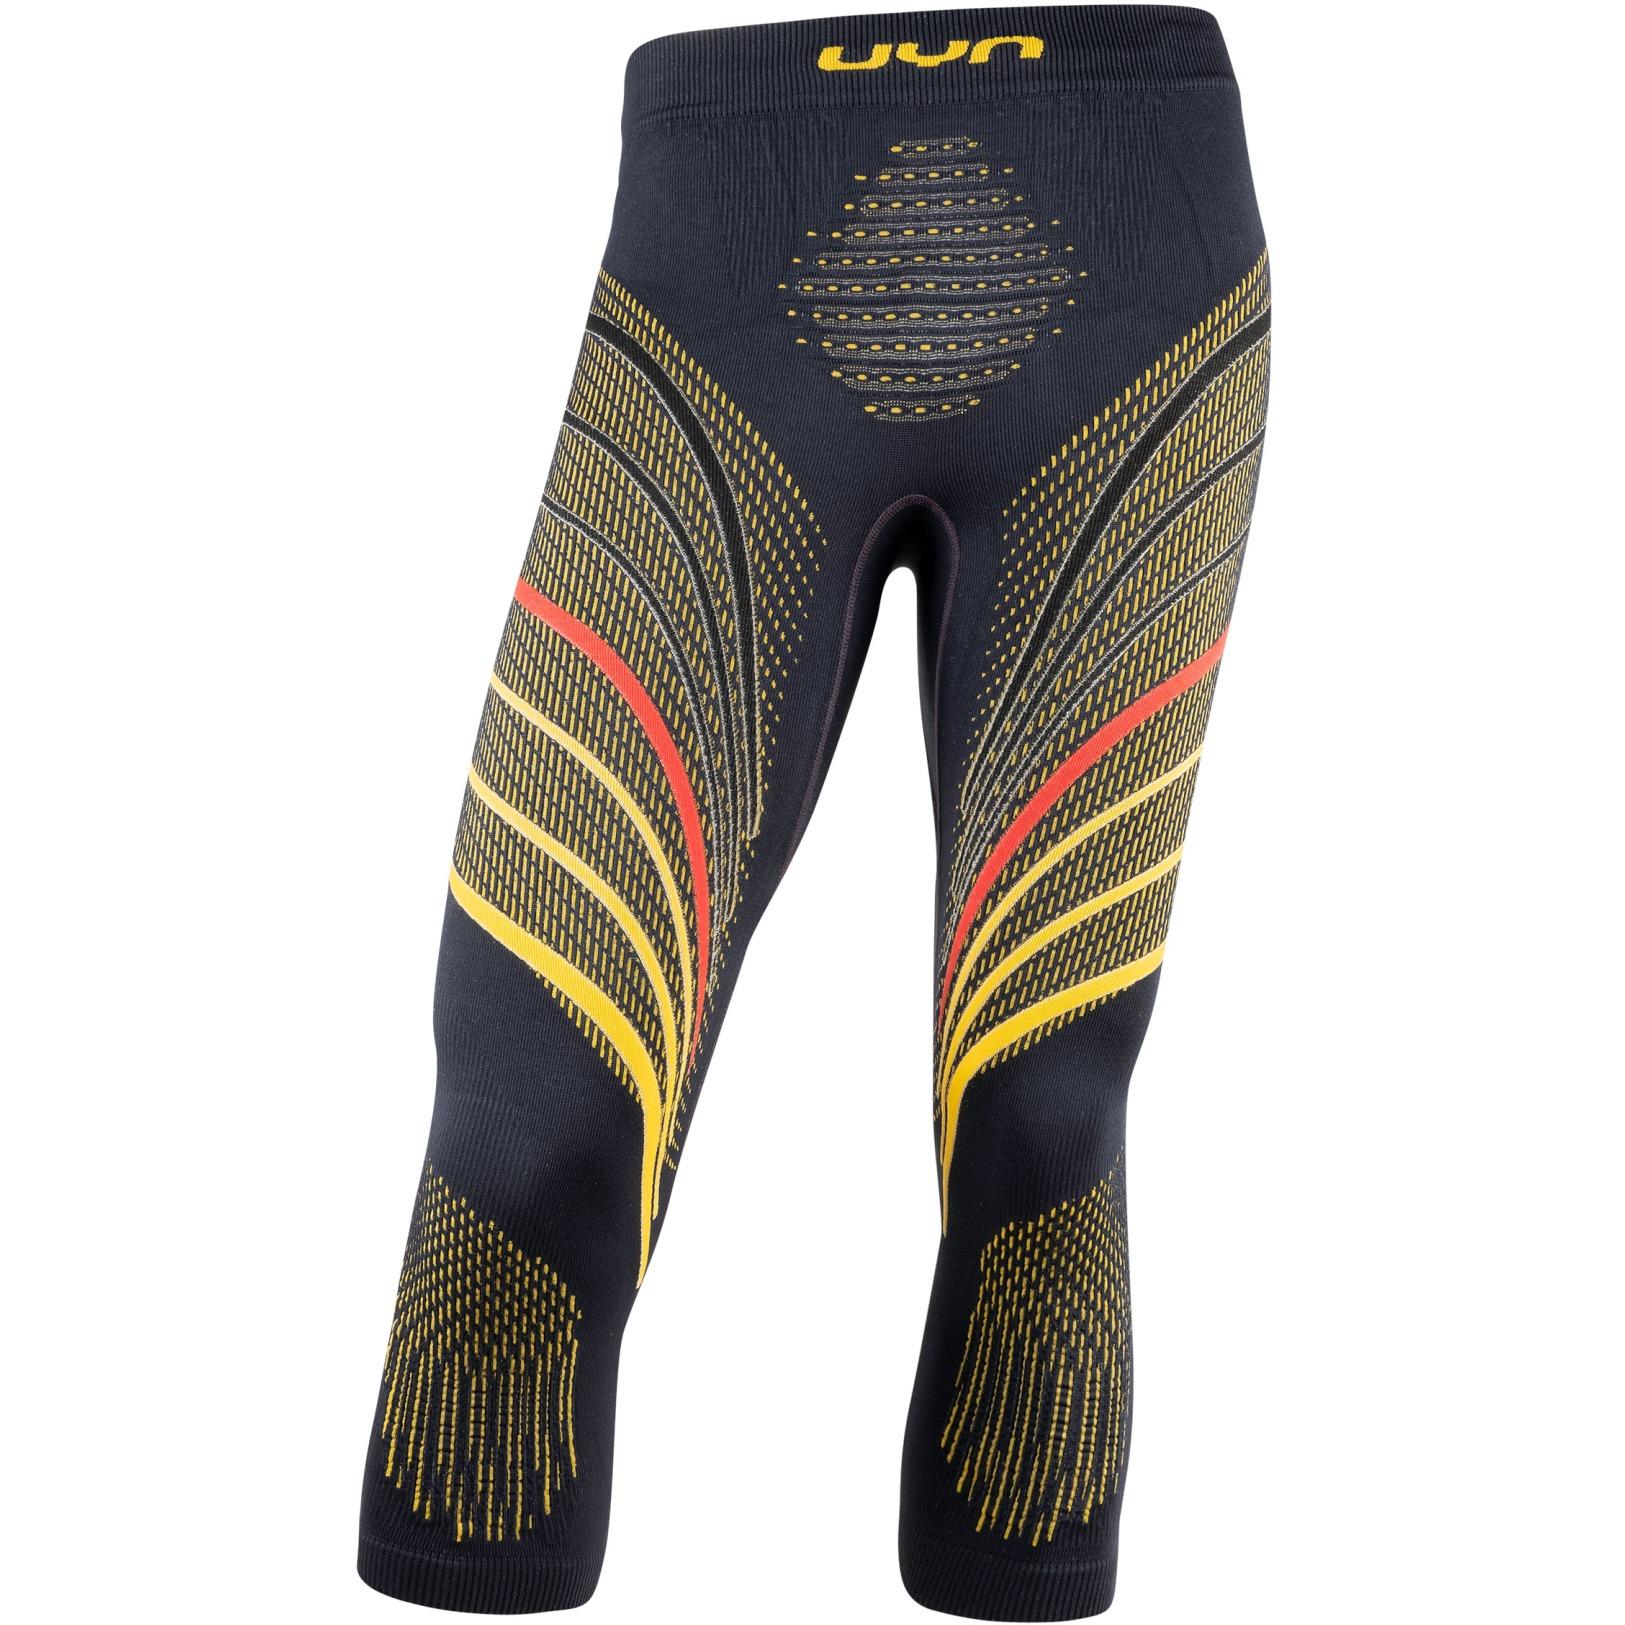 UYN Natyon 2.0 Germany Underwear Pants Medium - Germany